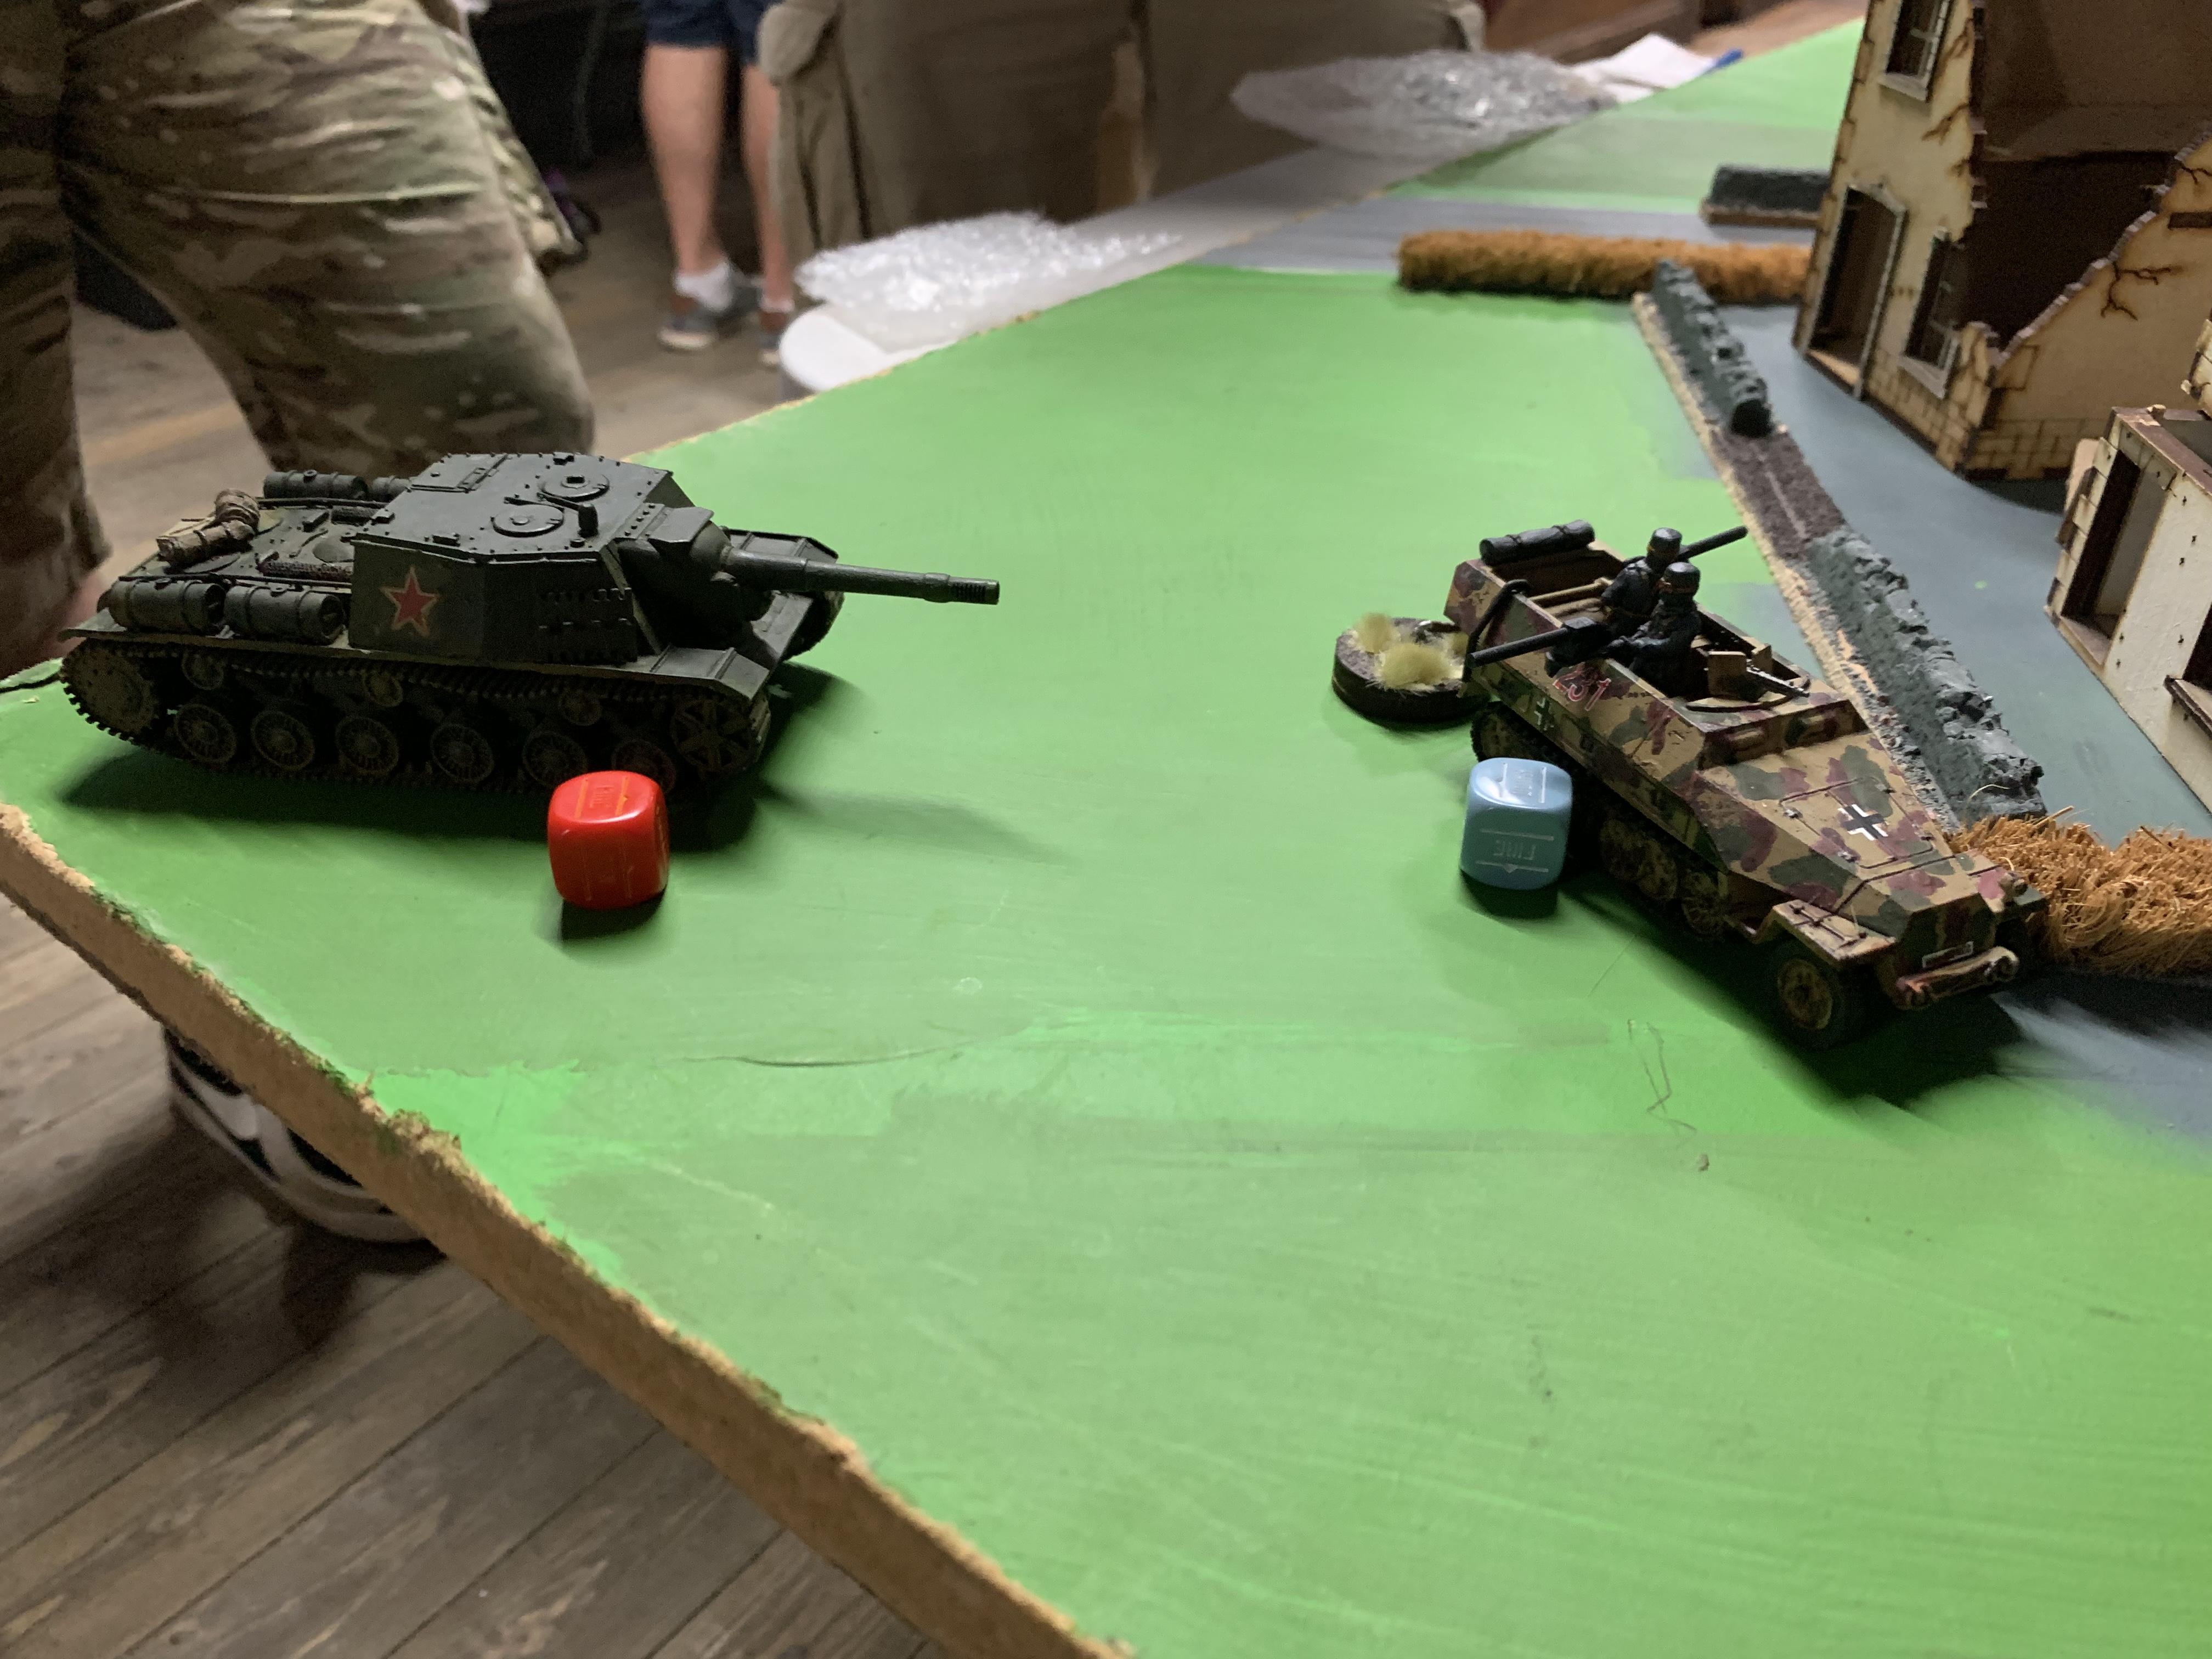 Red Death versus Brandenburgers in a fierce infantry engagement